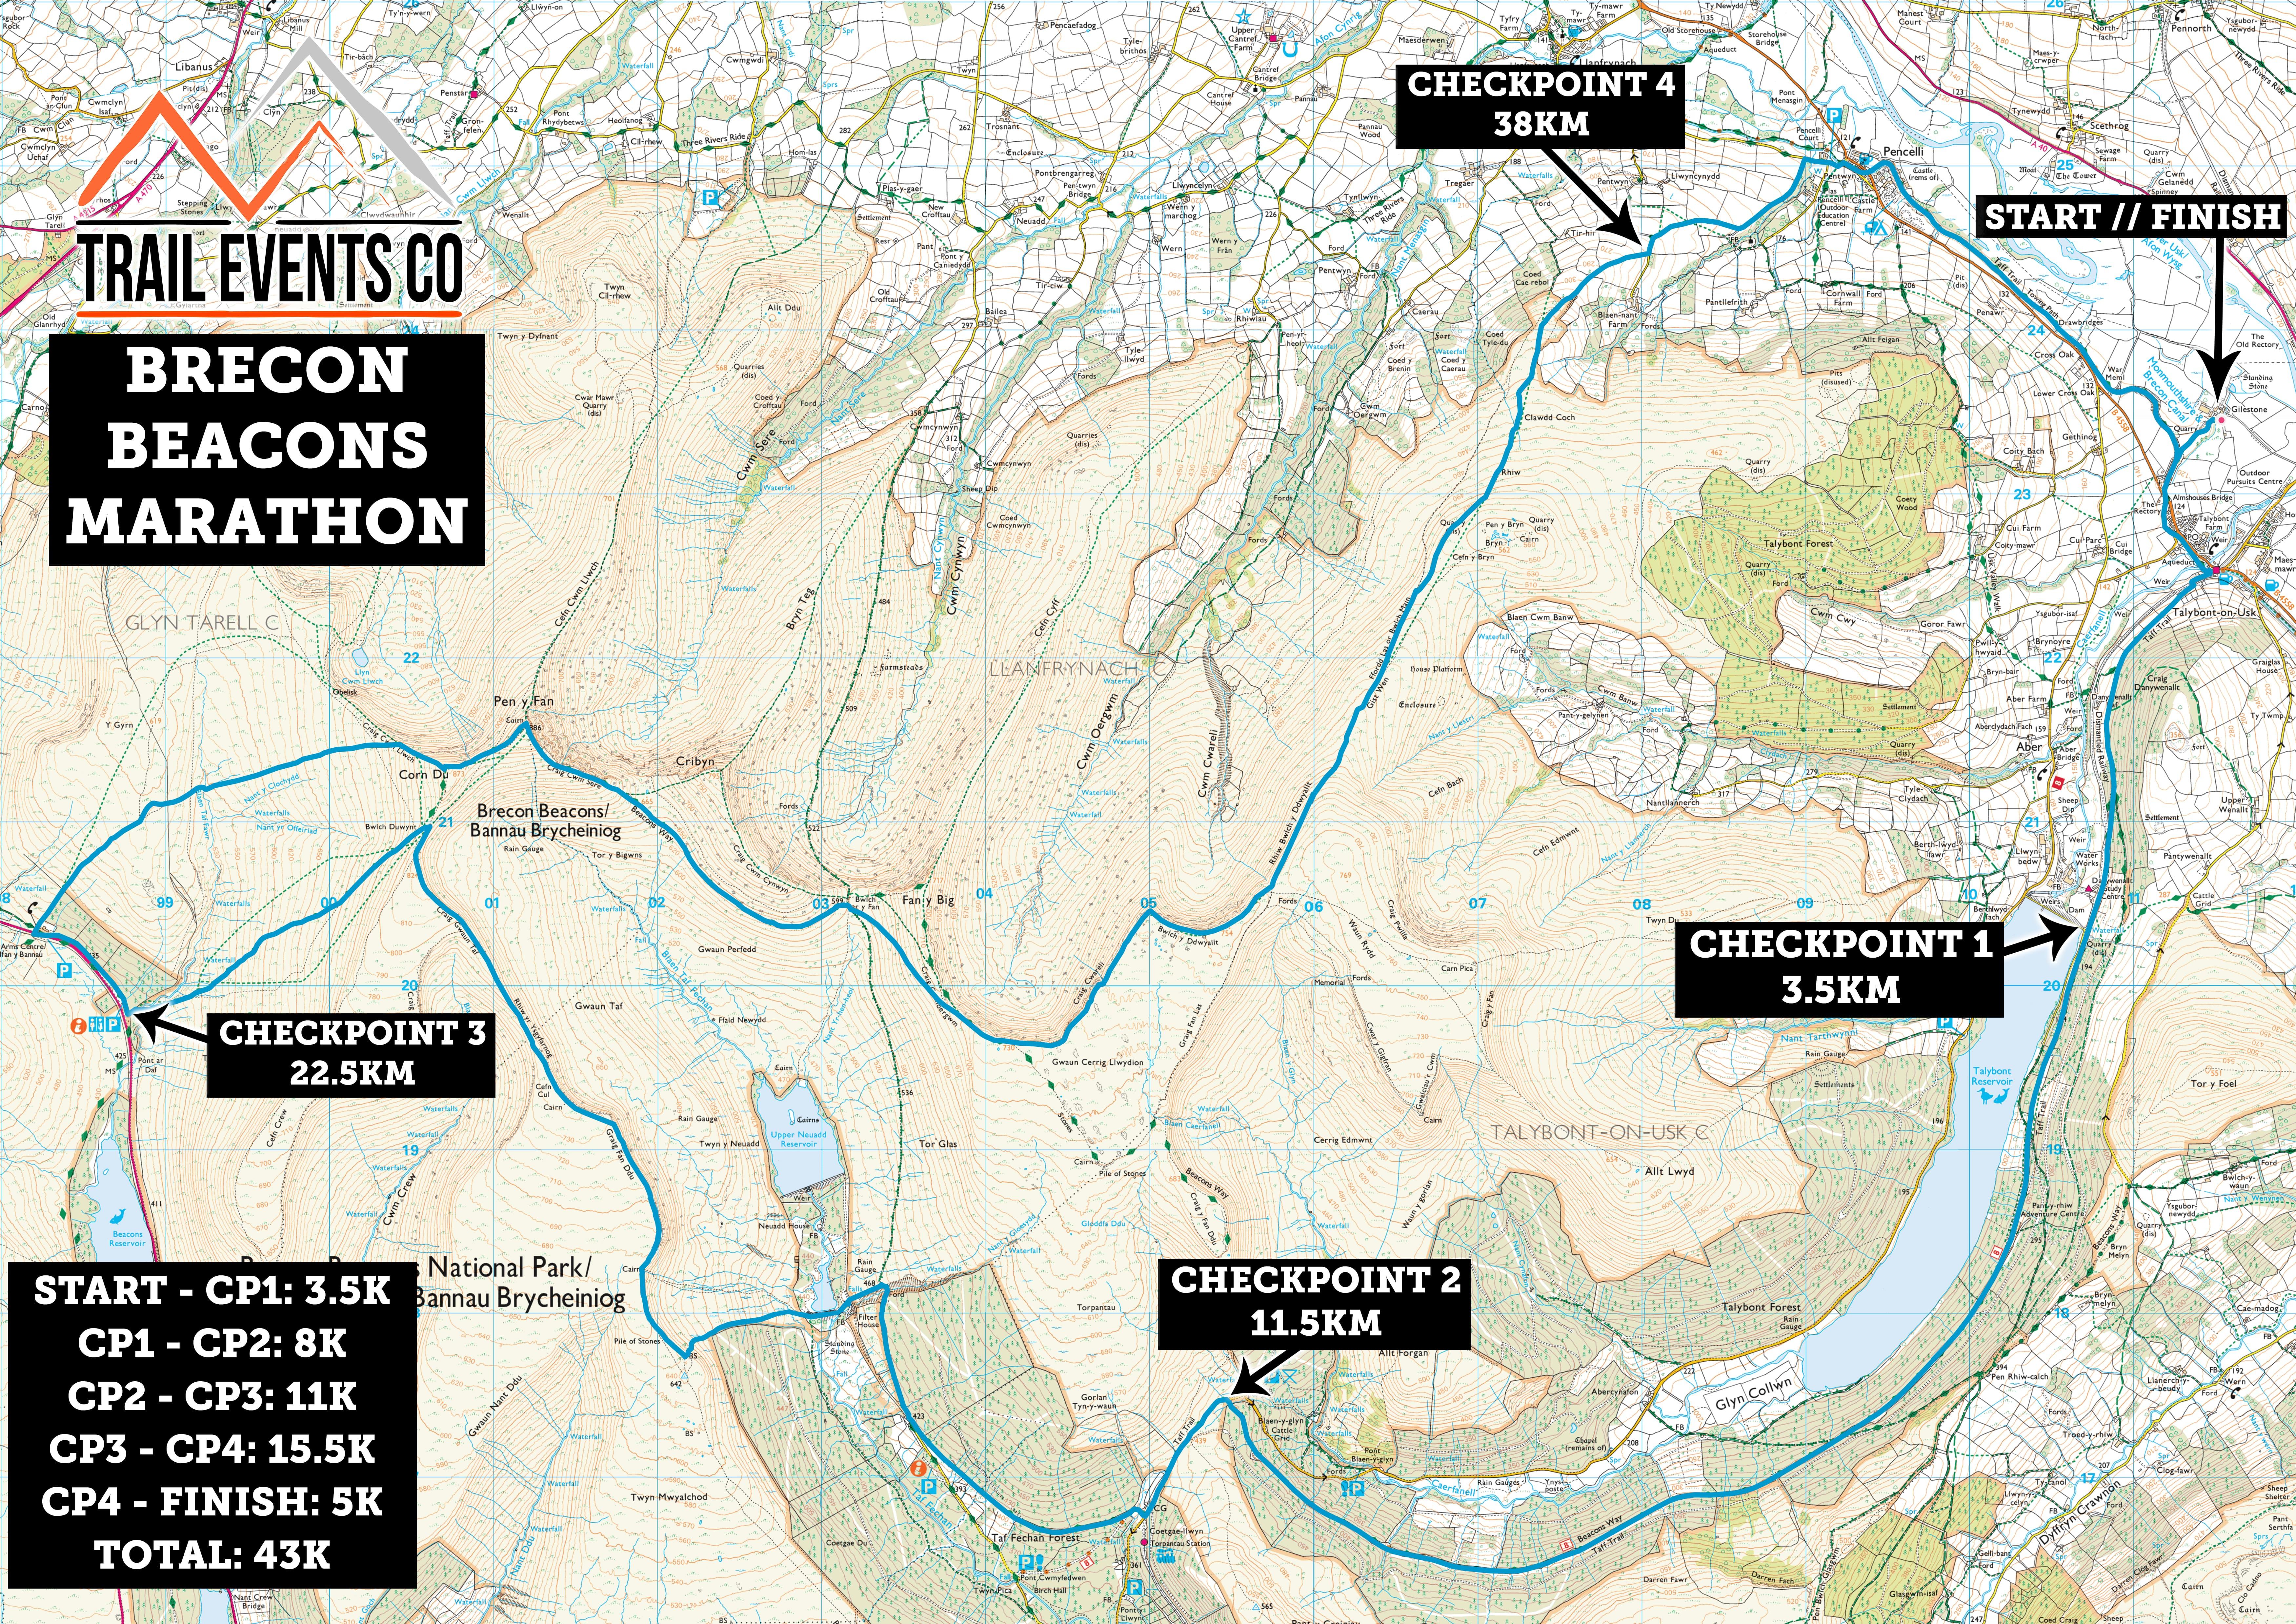 Marathon Brecon Beacons 2019 - Trail Events Co